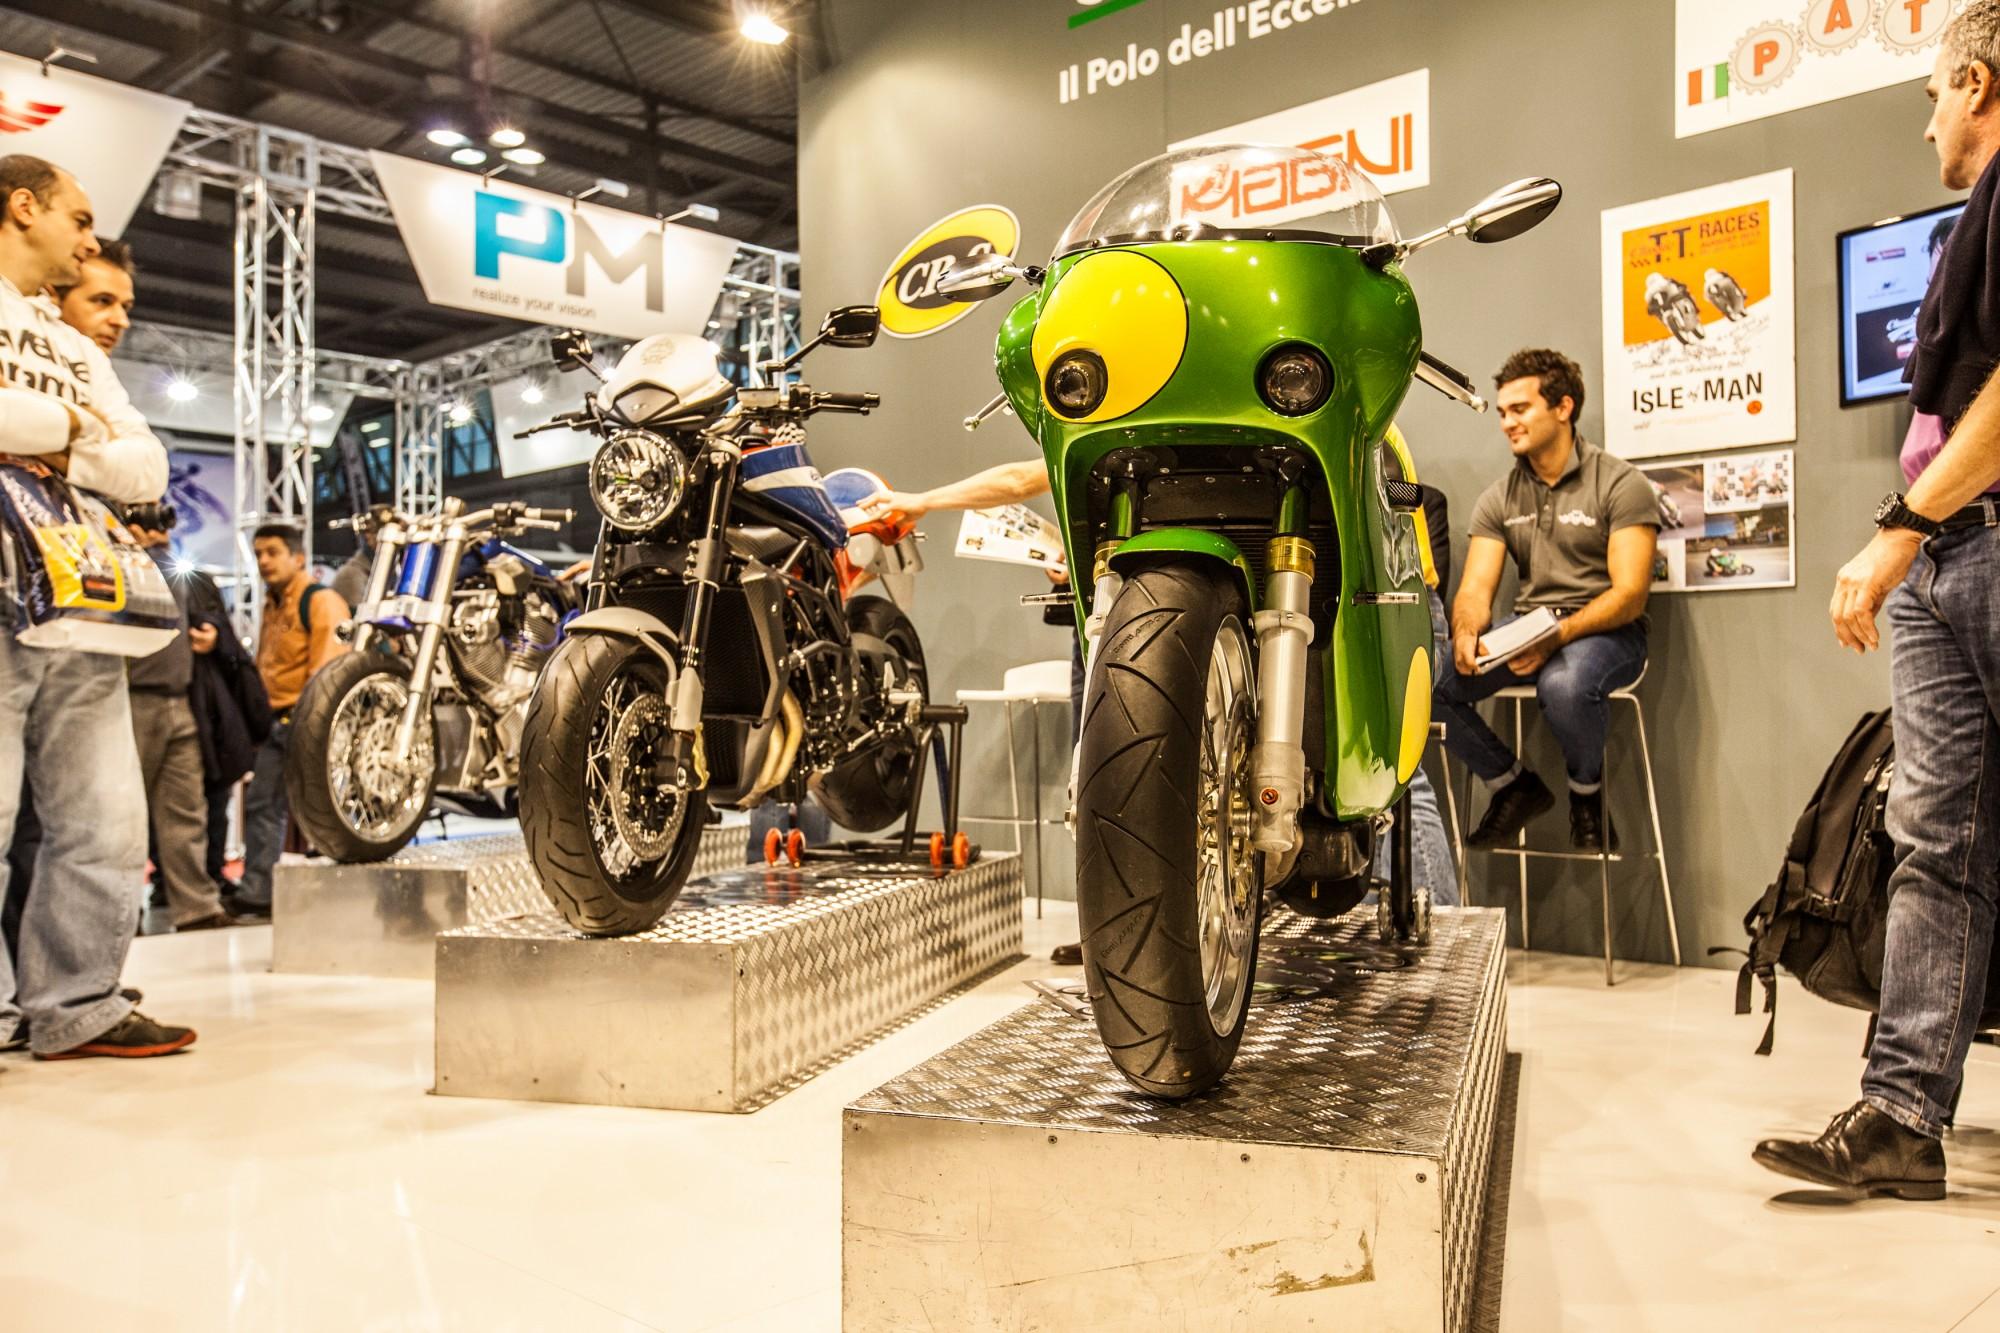 Officina moto italia for Officina moto italia